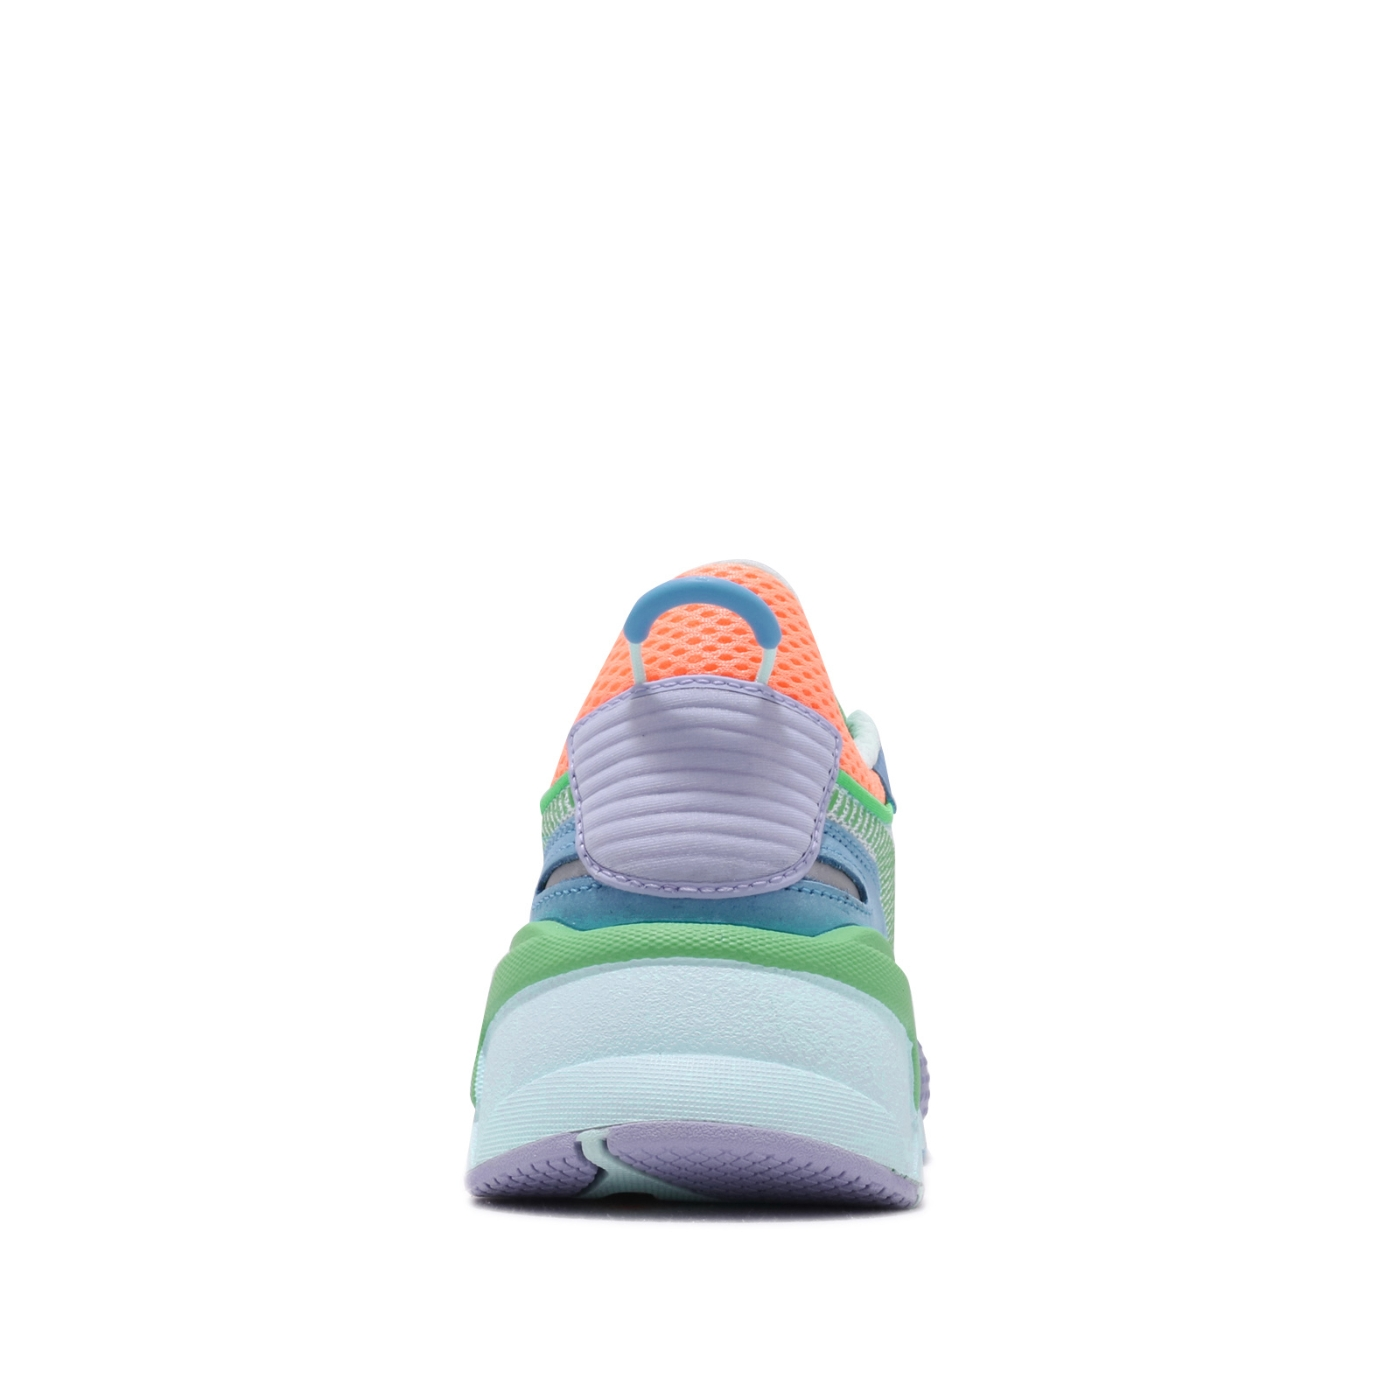 Puma 休閒鞋 RSX Toys 女鞋